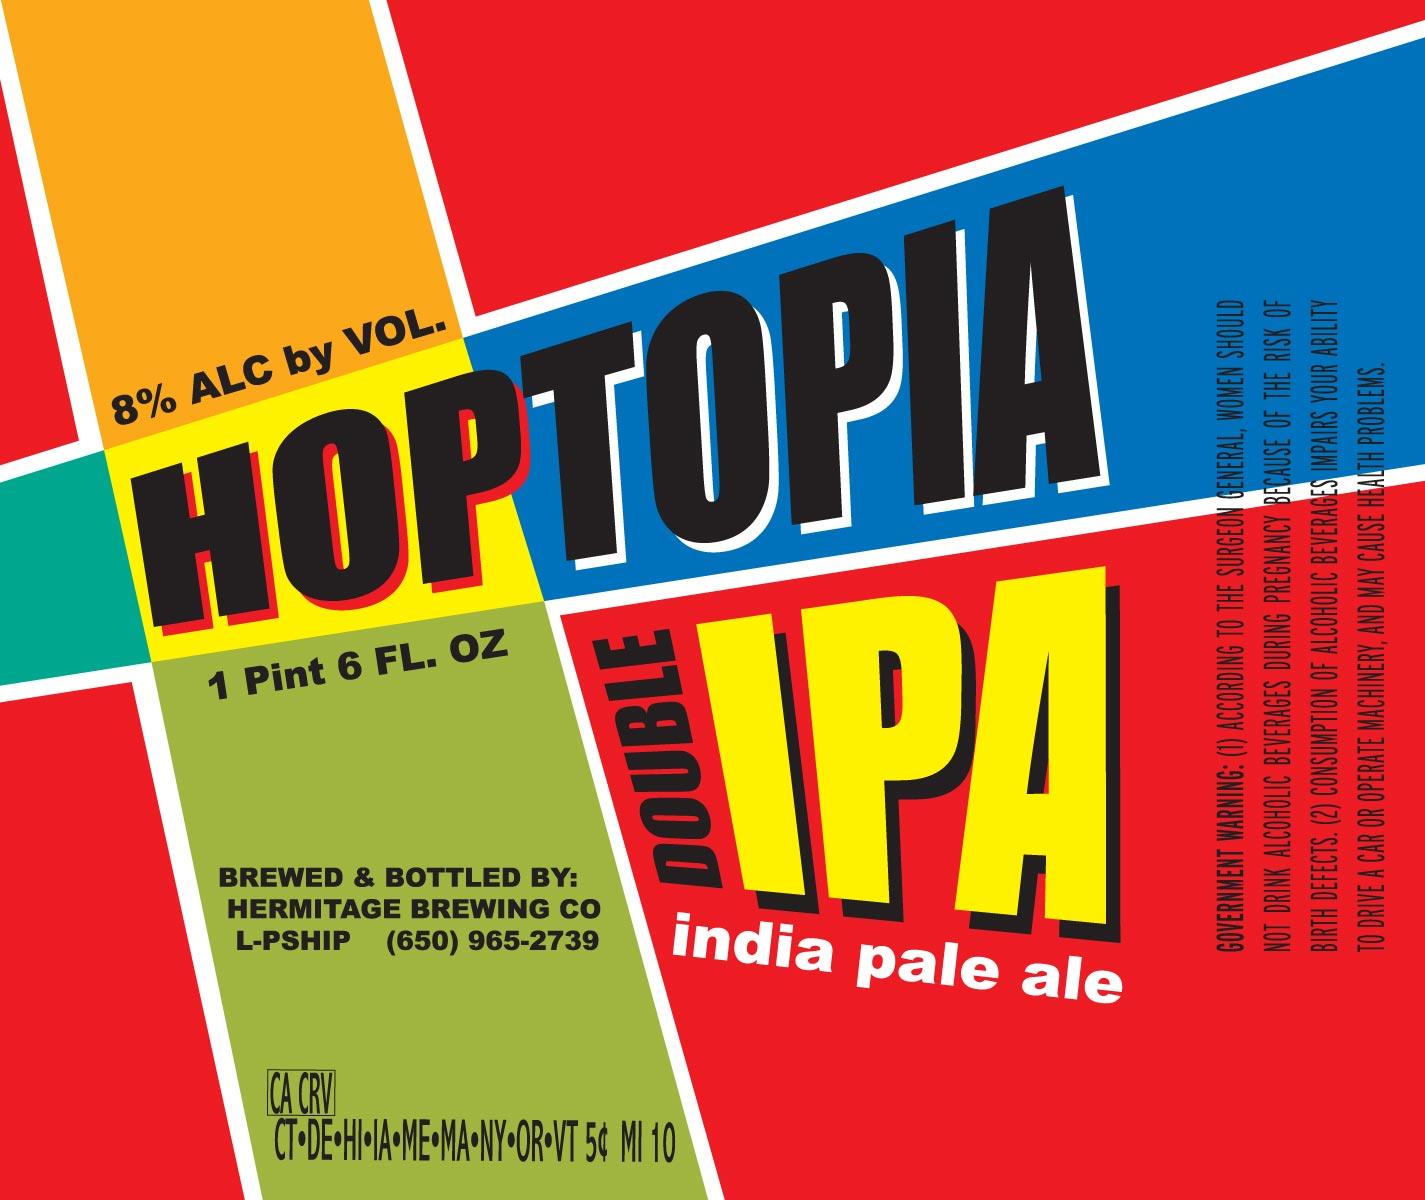 hoptopia_22oz-final.jpg